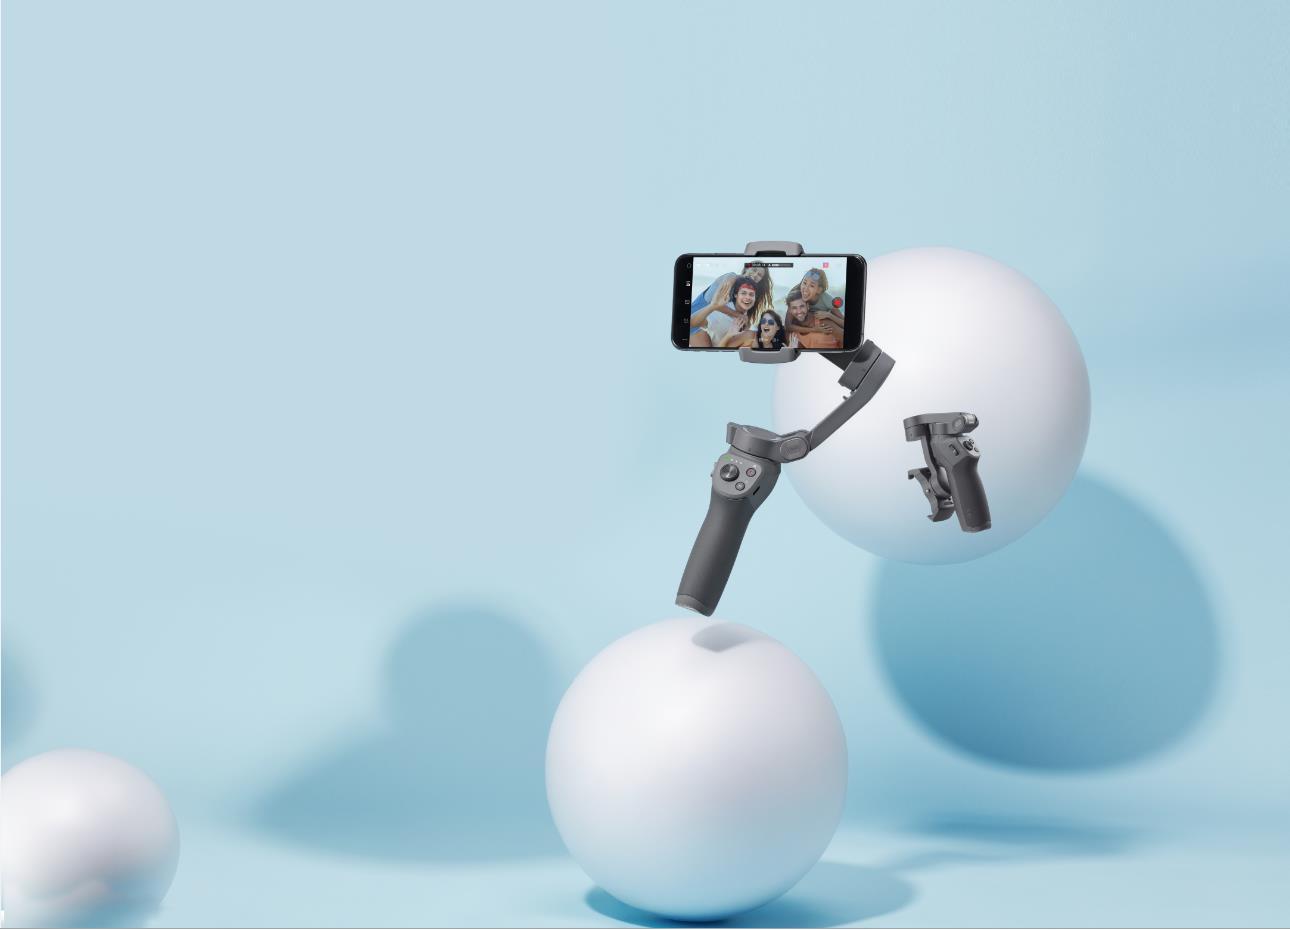 DJI 大疆 Osmo Mobile 灵眸手机云台 3 防抖可折叠手机稳定器